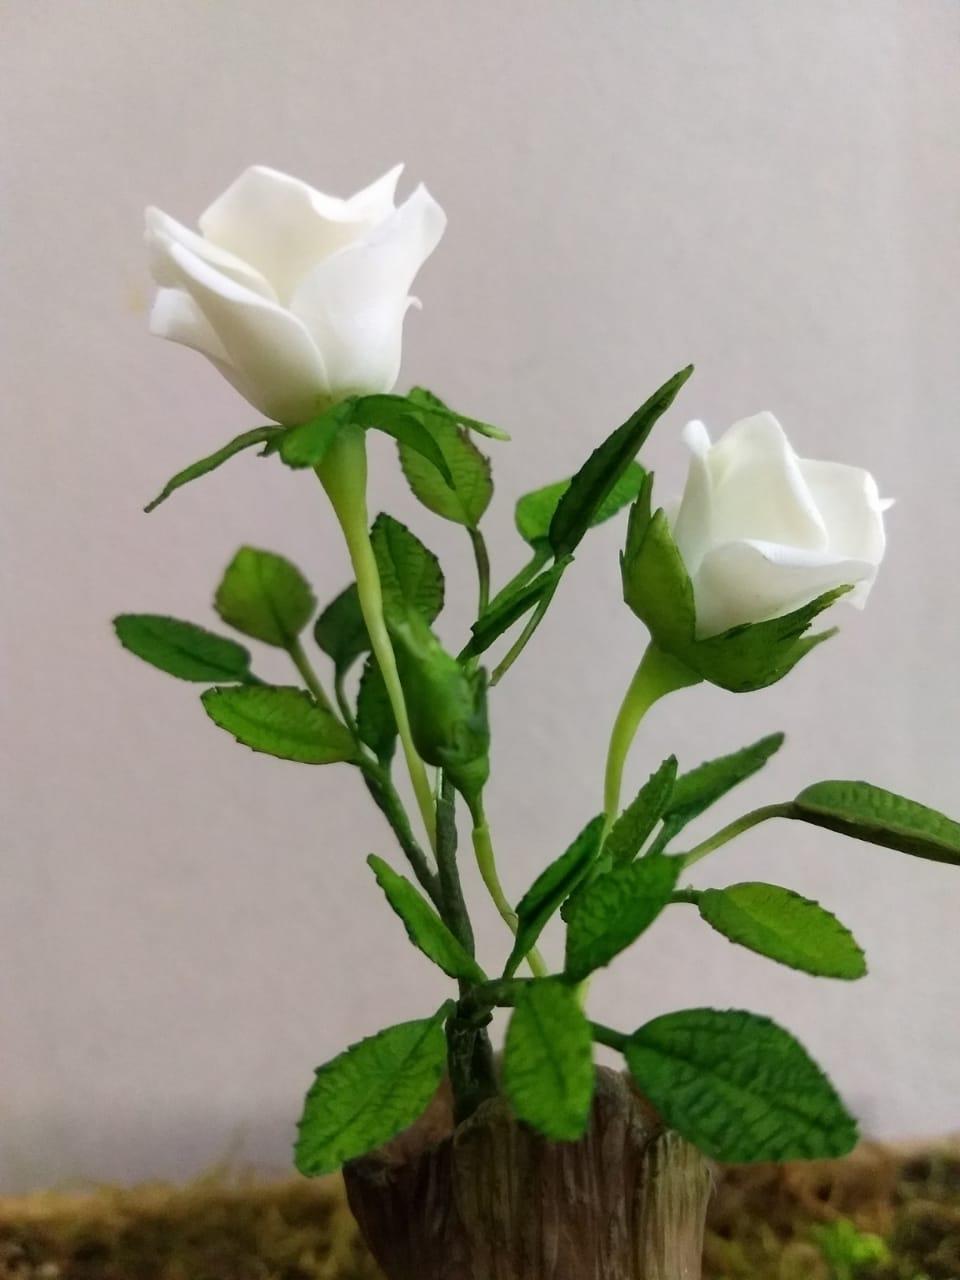 Míni- rosas